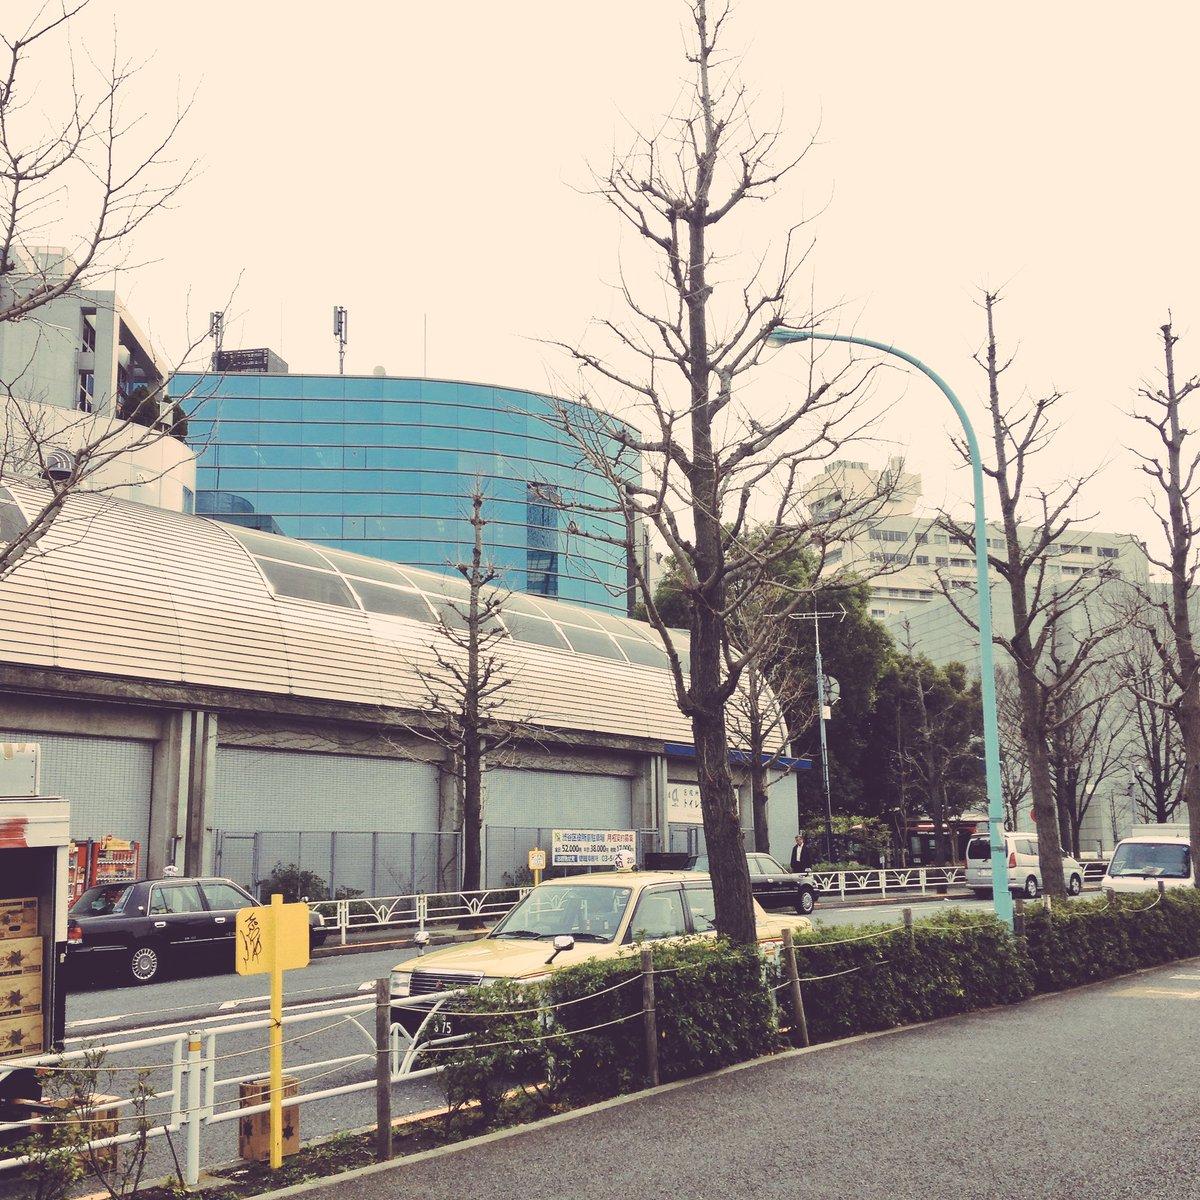 人間発電所 #WASSUPTOKYO #WASSUPTYO https://t.co/TEBR3fbzSv